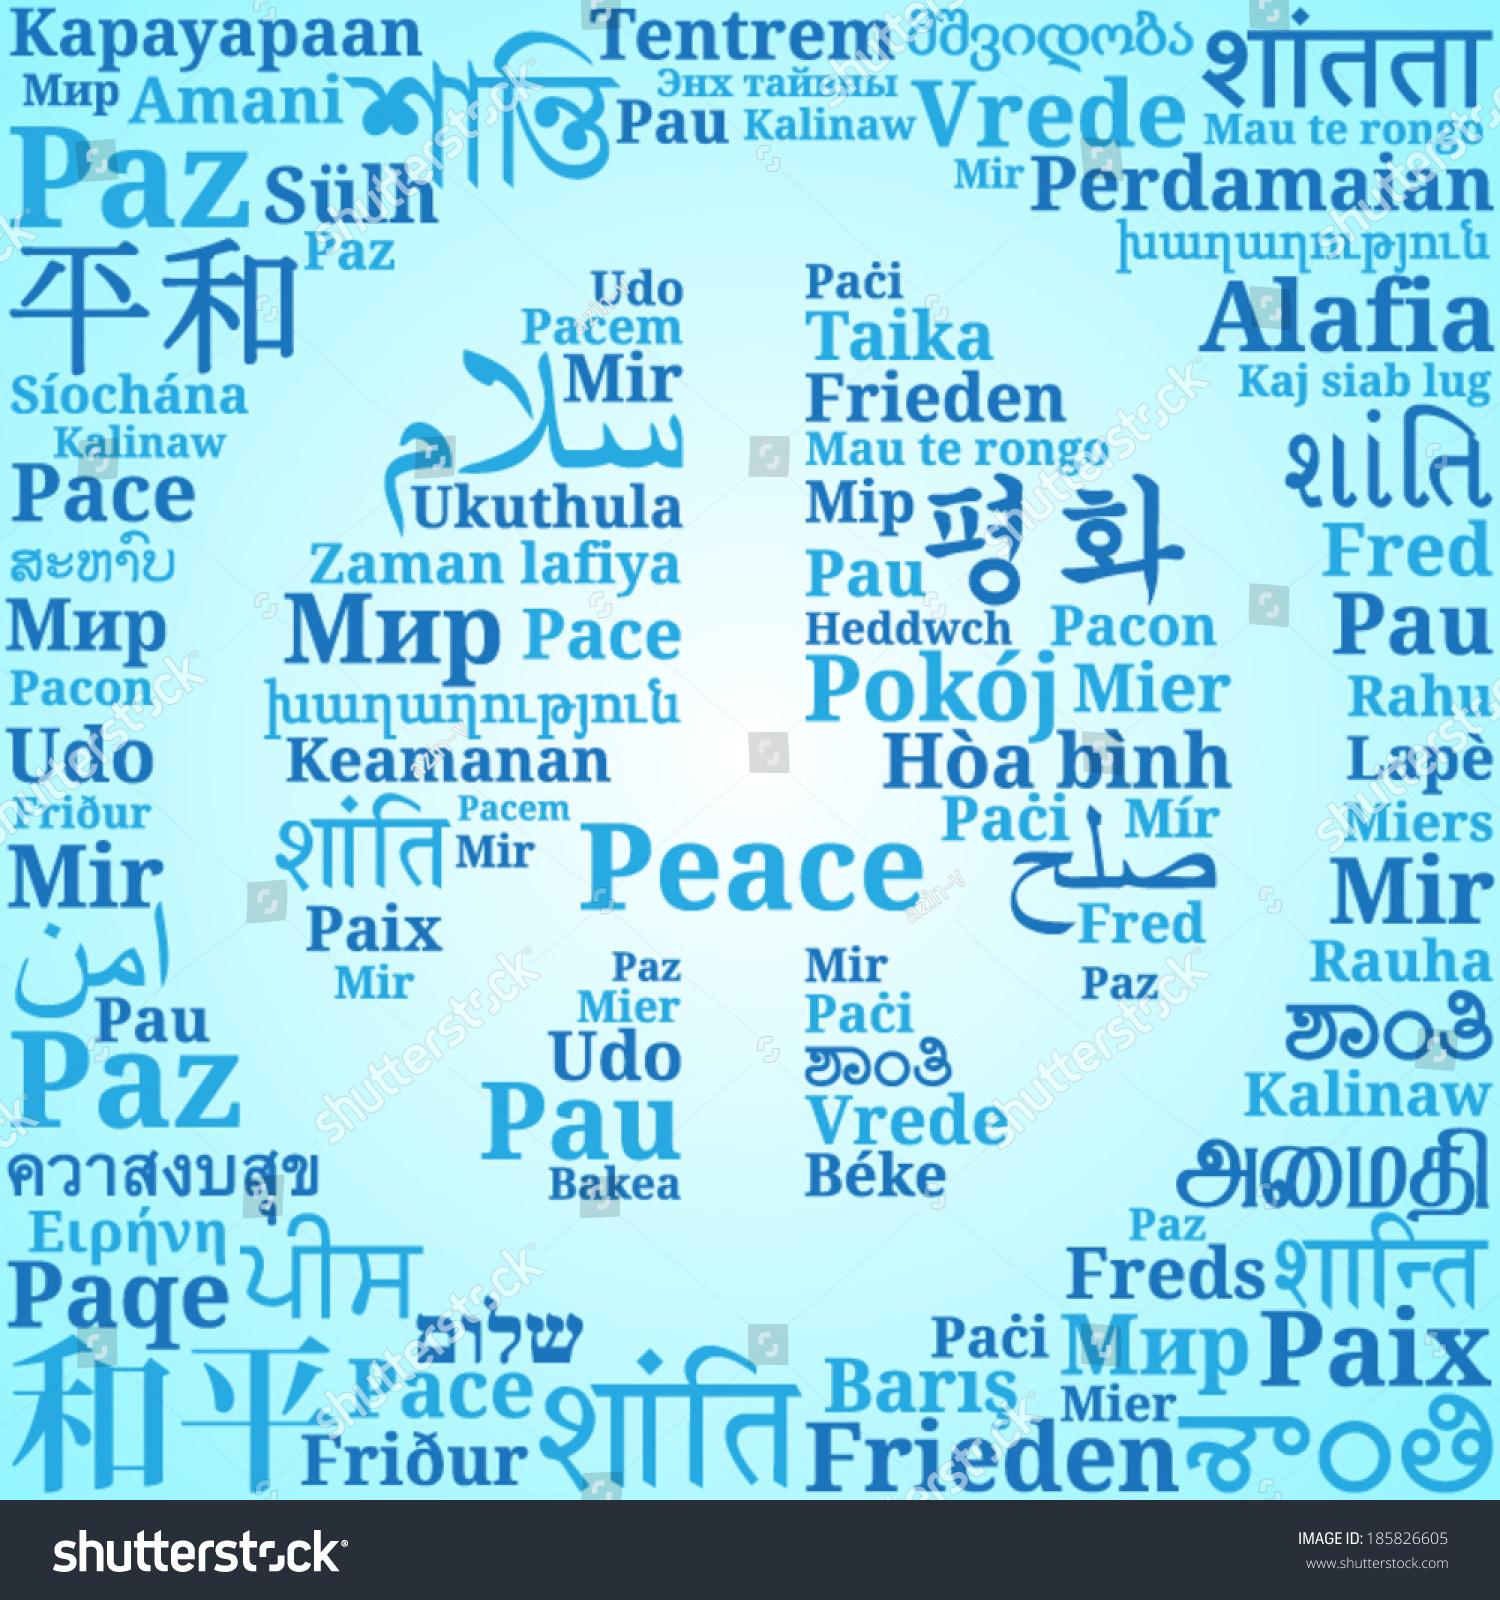 mahal ko in different languages